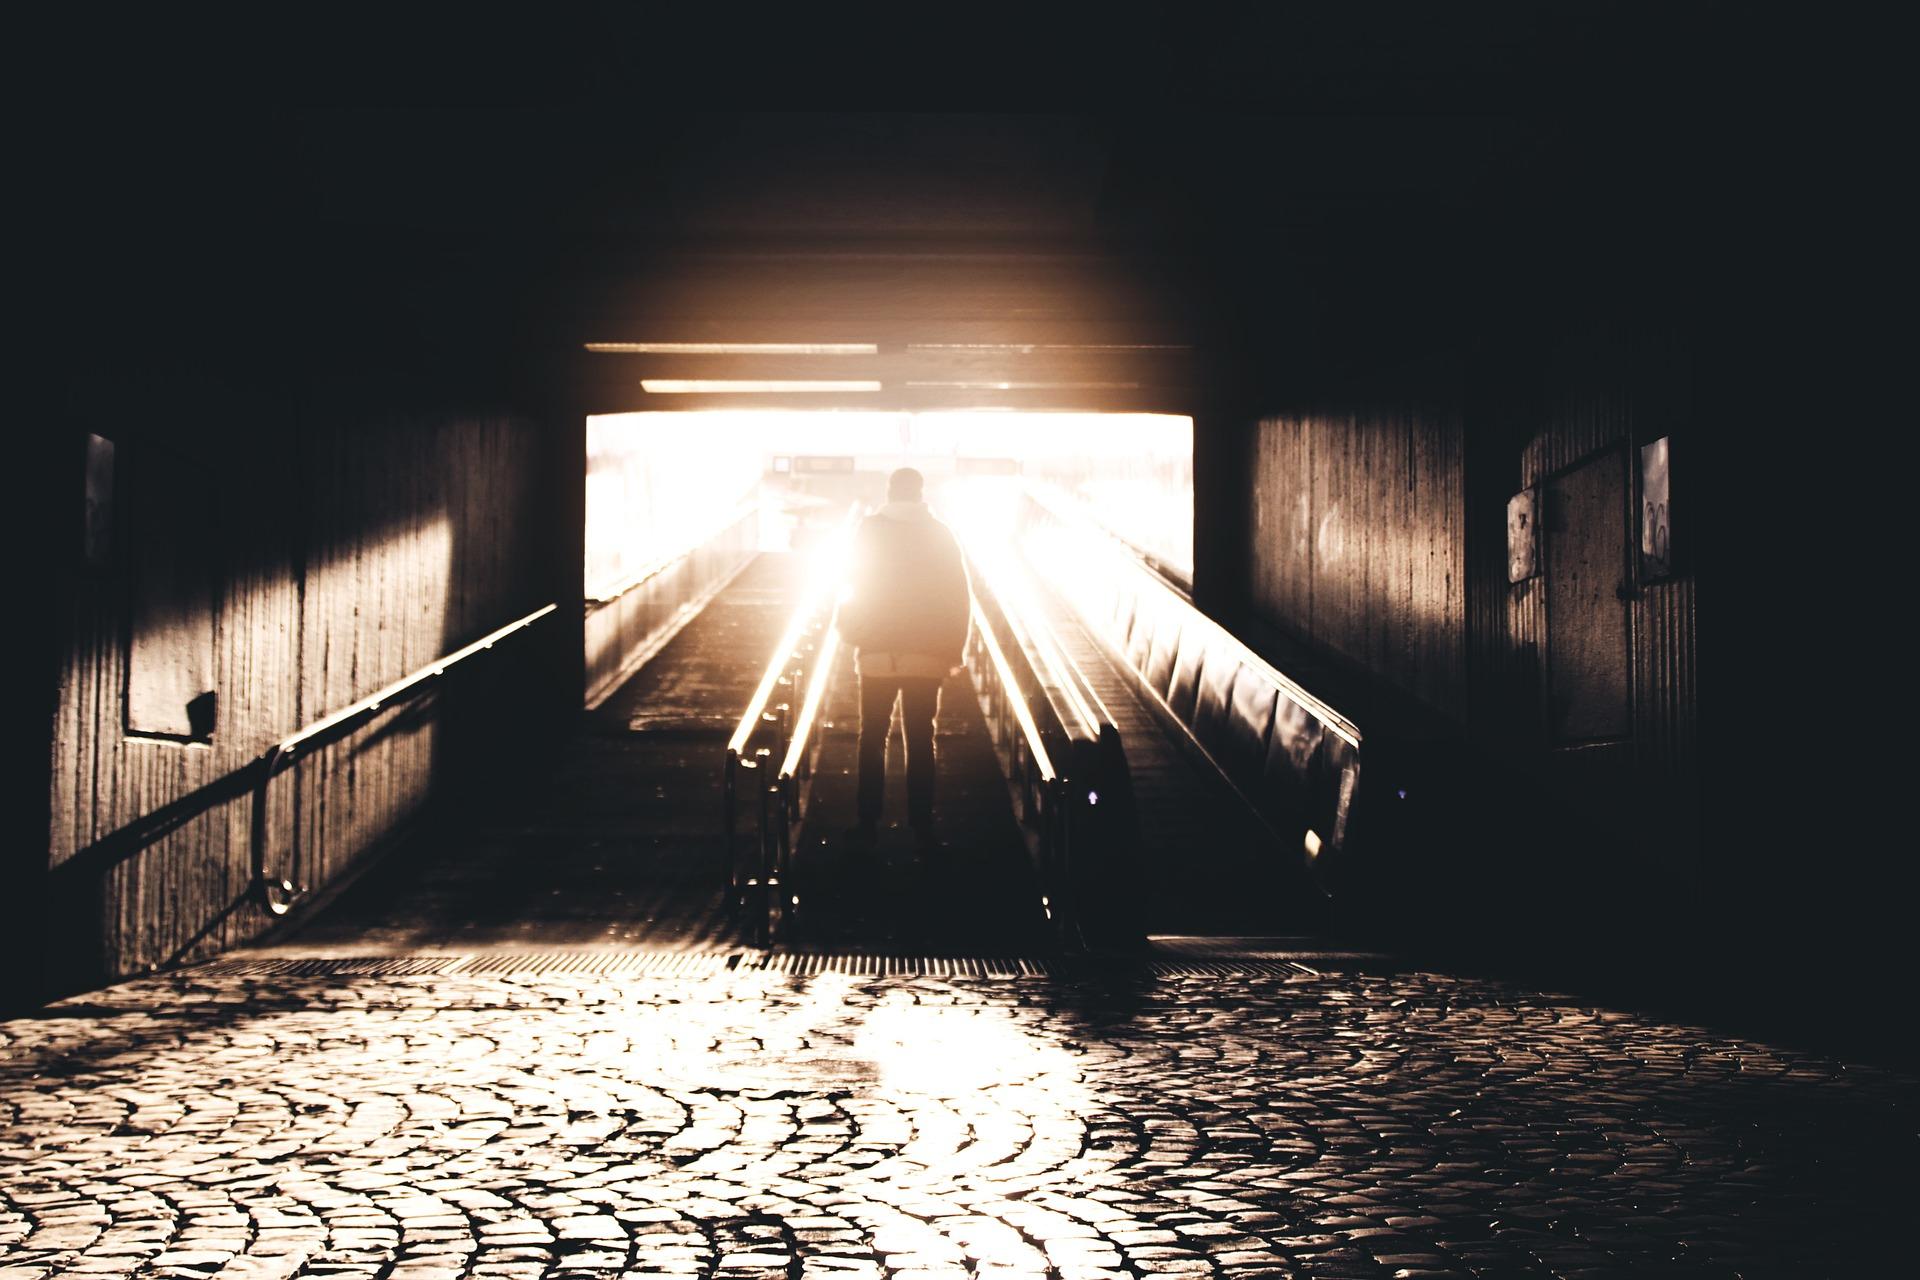 Encerrar ciclos: a difícil arte de recomeçar